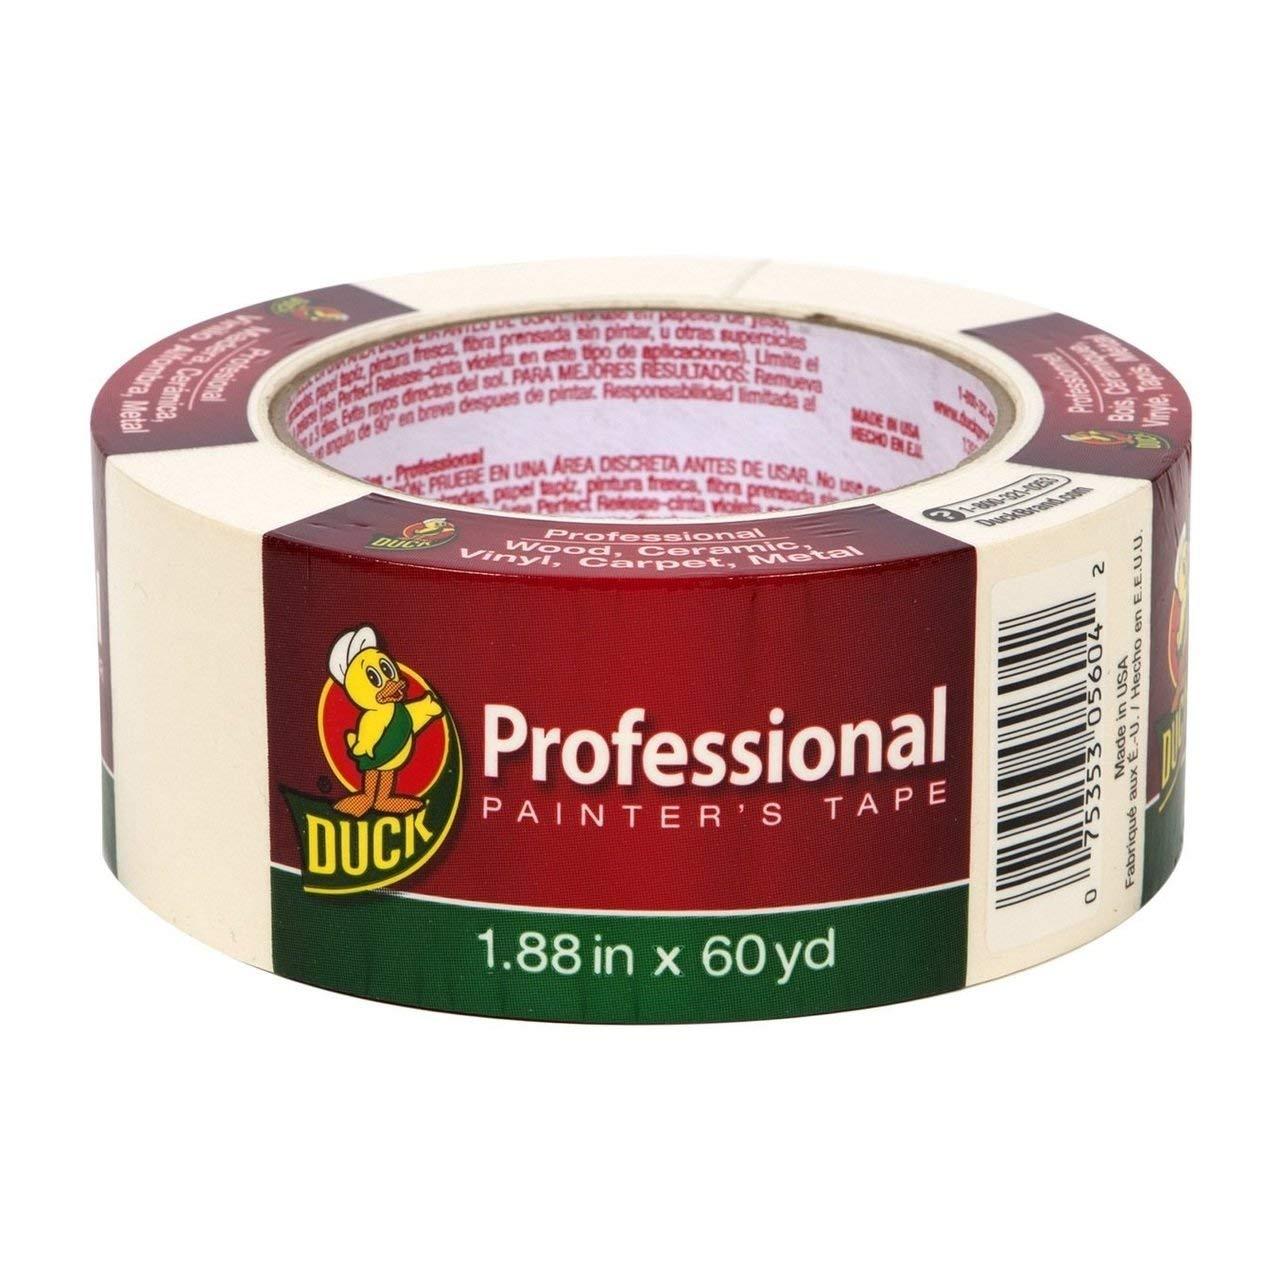 "Bulk Professional Grade Painters Tape, 1.88"" x60yd, Beige: Duck Brand 1361966 (84 Painters Tape Rolls)"